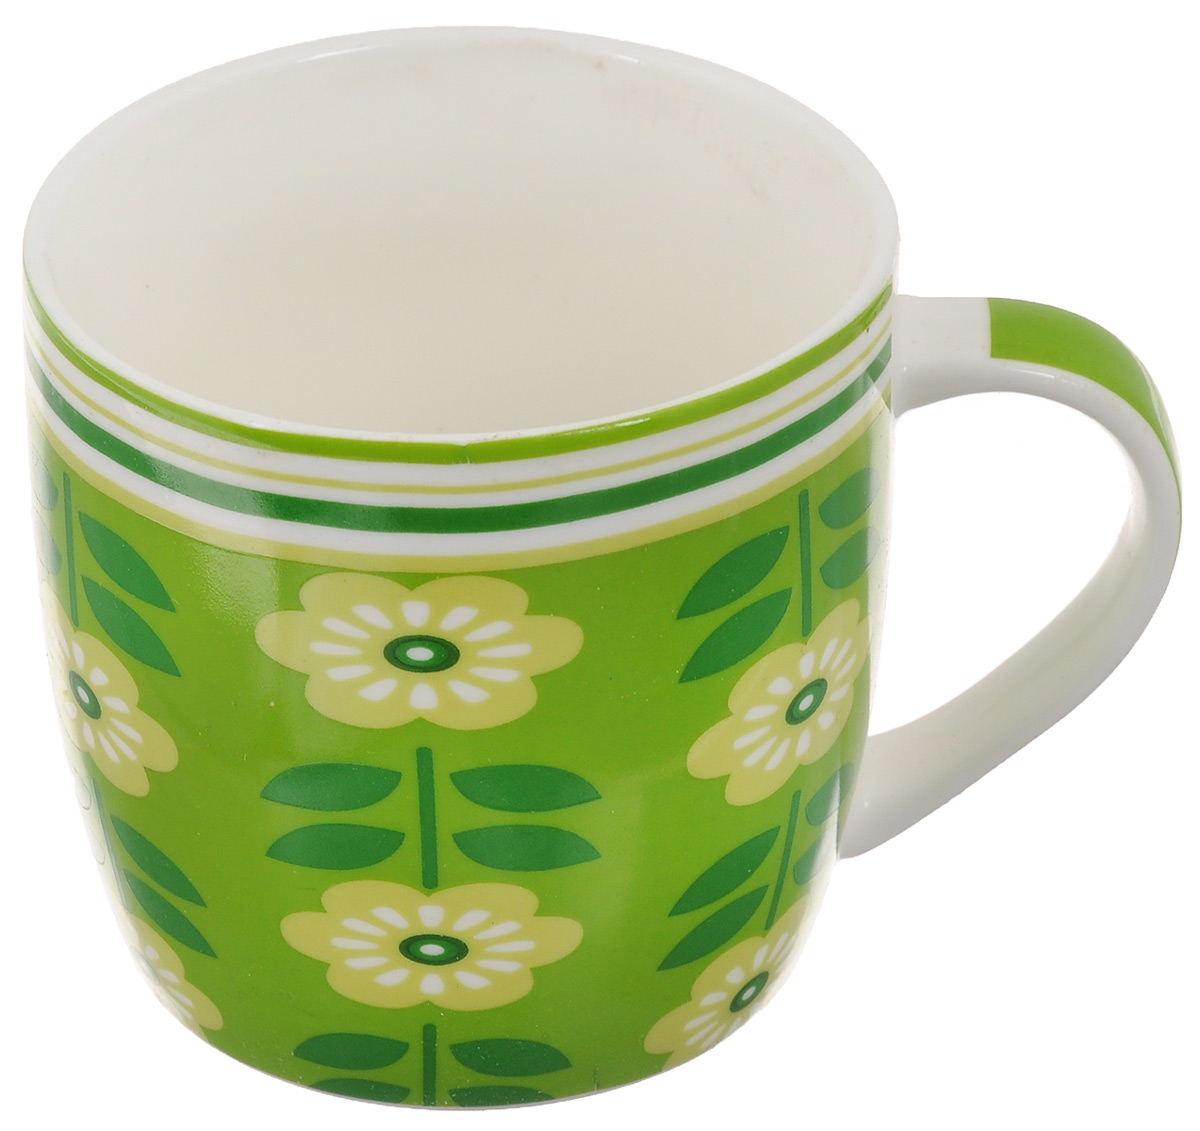 Кружка Loraine Цветы, цвет: зеленый, салатовый, белый, 320 мл кружка loraine цвет белый красный голубой 320 мл 24484